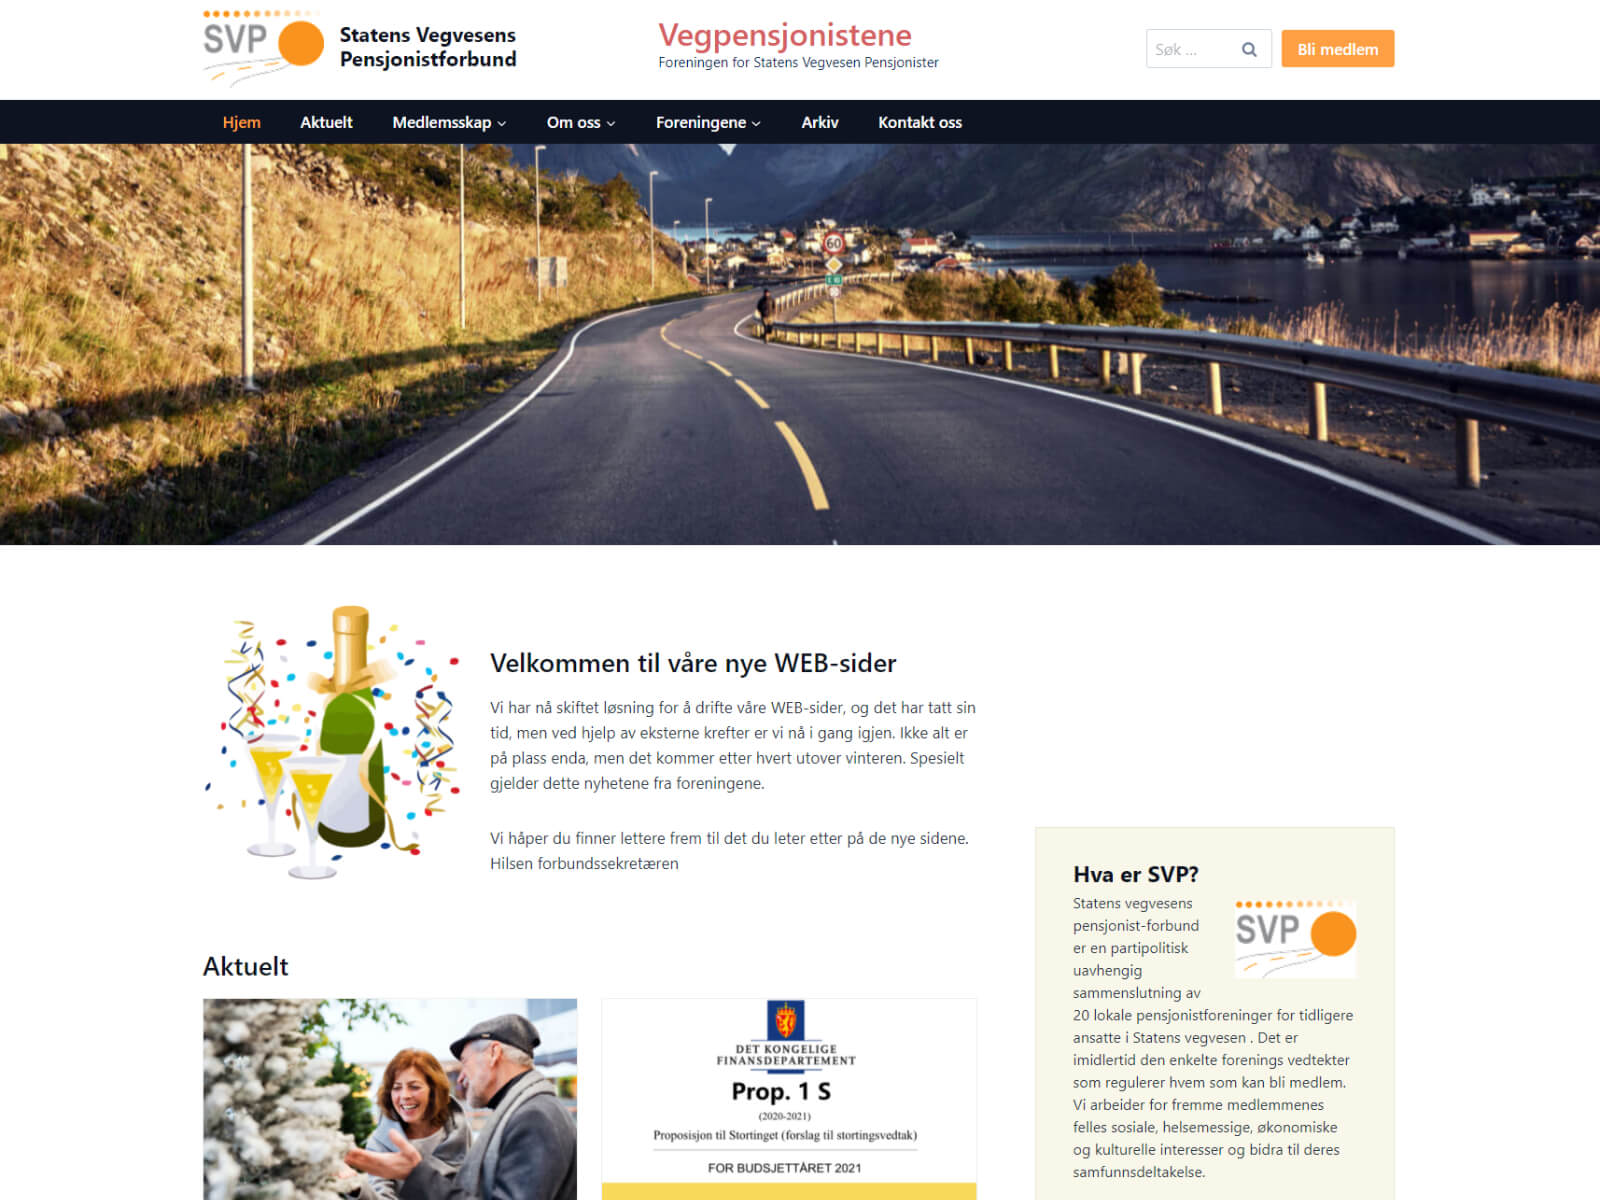 Statens Vegvesens Pensjonistforbund webside